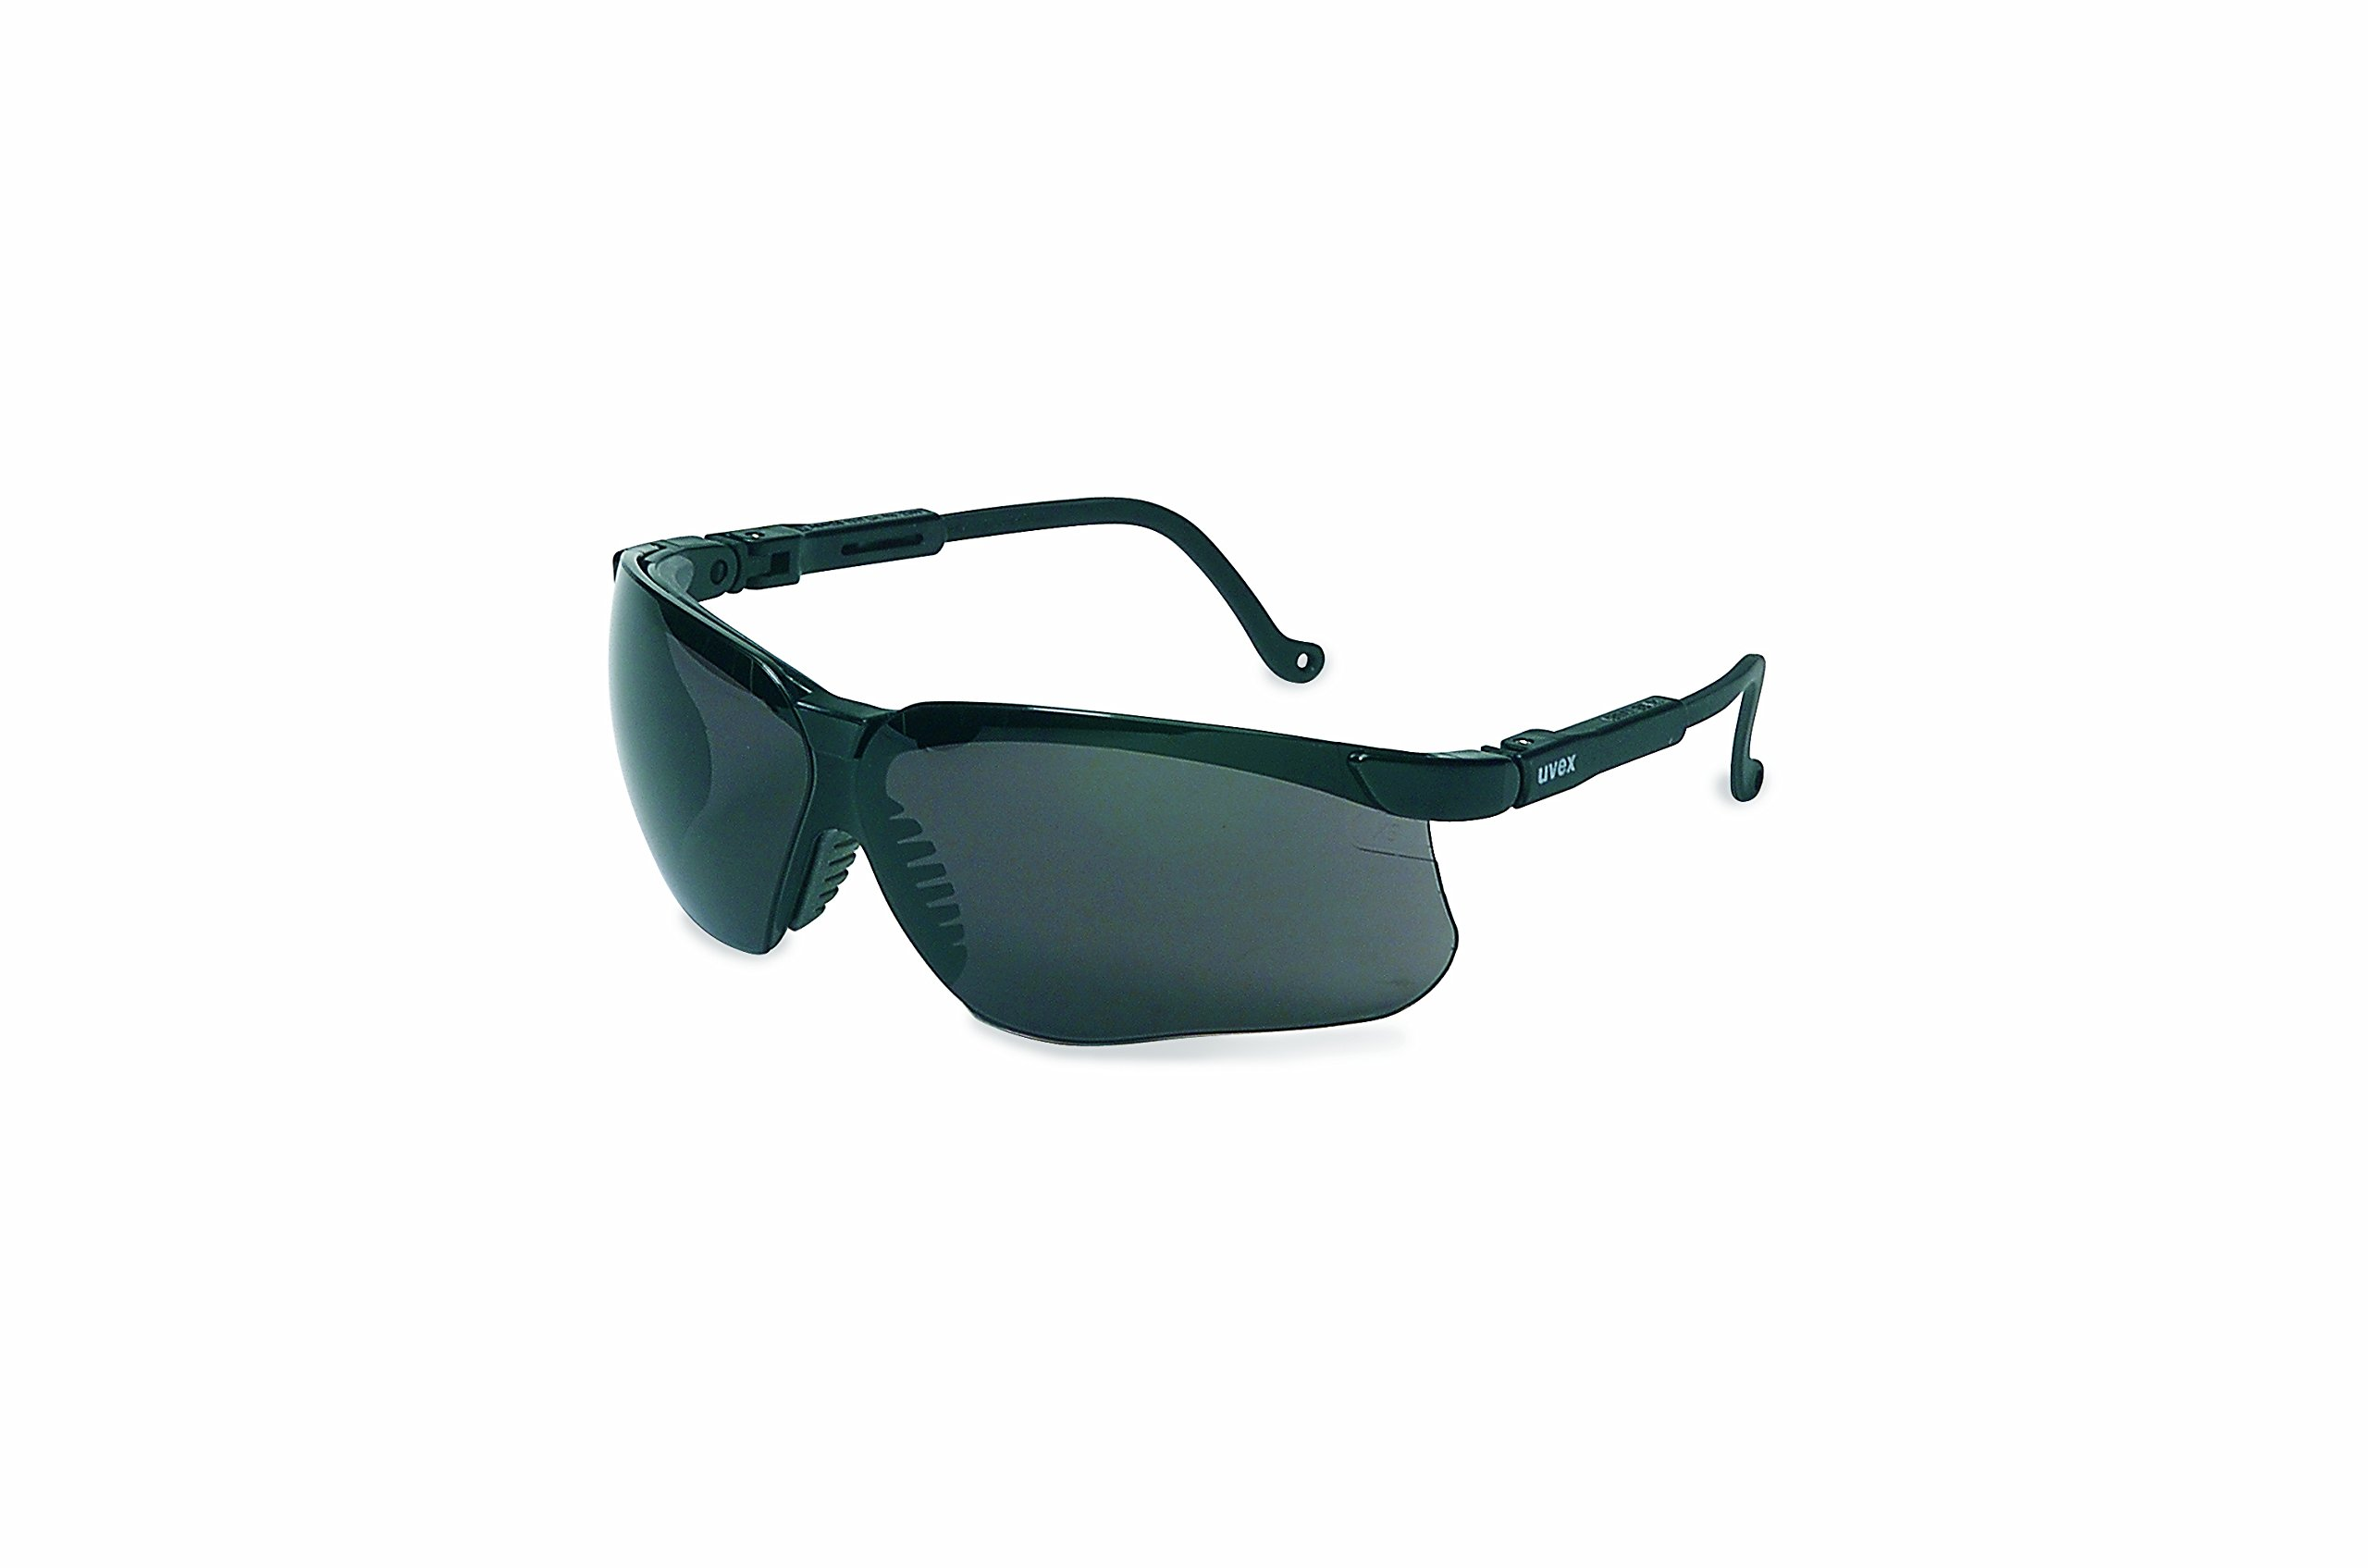 UVEX by Honeywell - S3212X Uvex by Honeywell Genesis Safety Glasses with Uvextreme Anti-Fog Coating, Black Frame